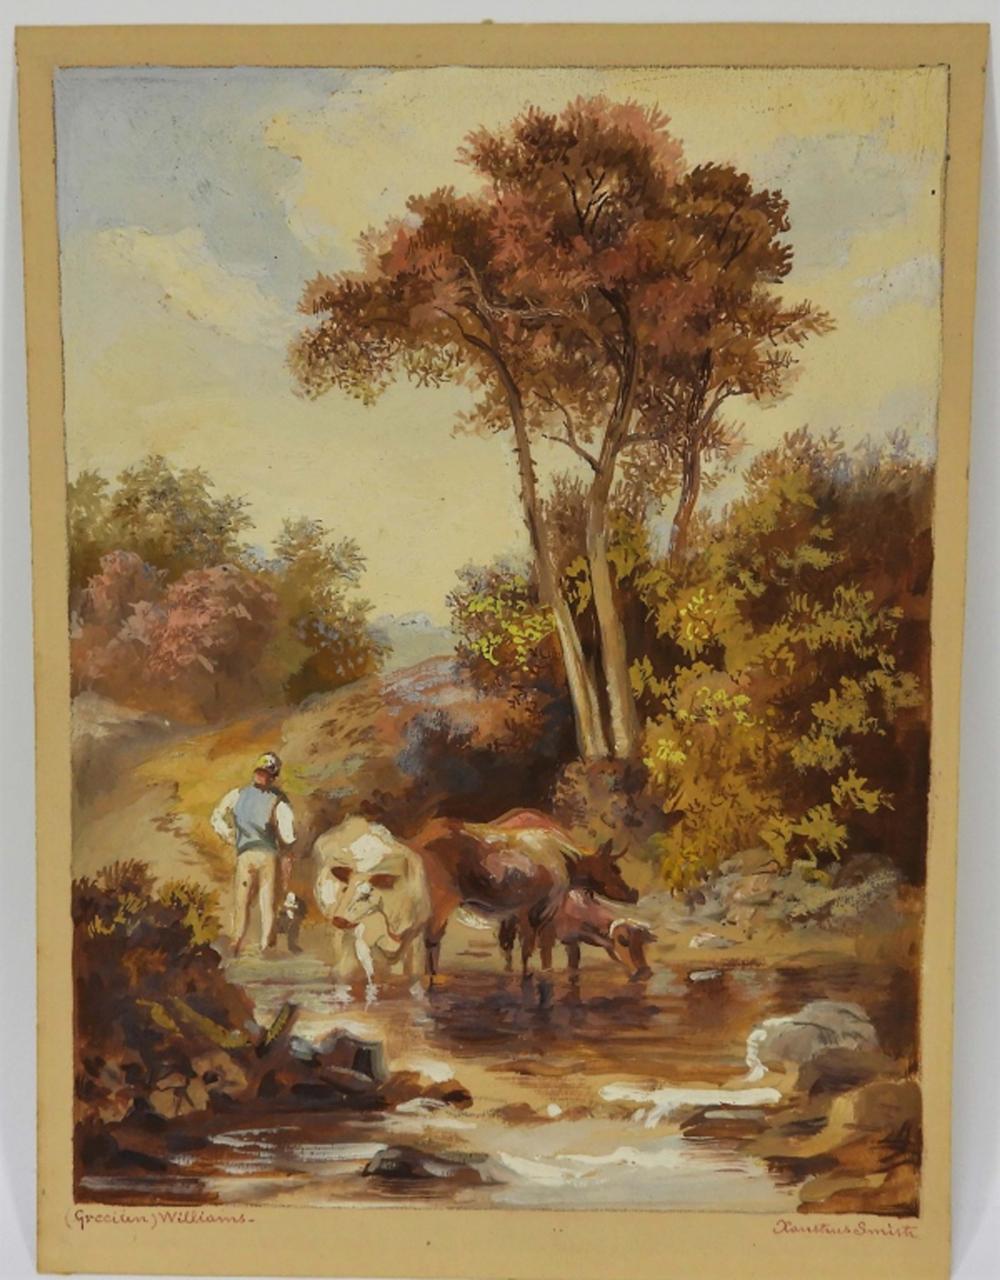 19C American School Pastoral Watercolor Painting